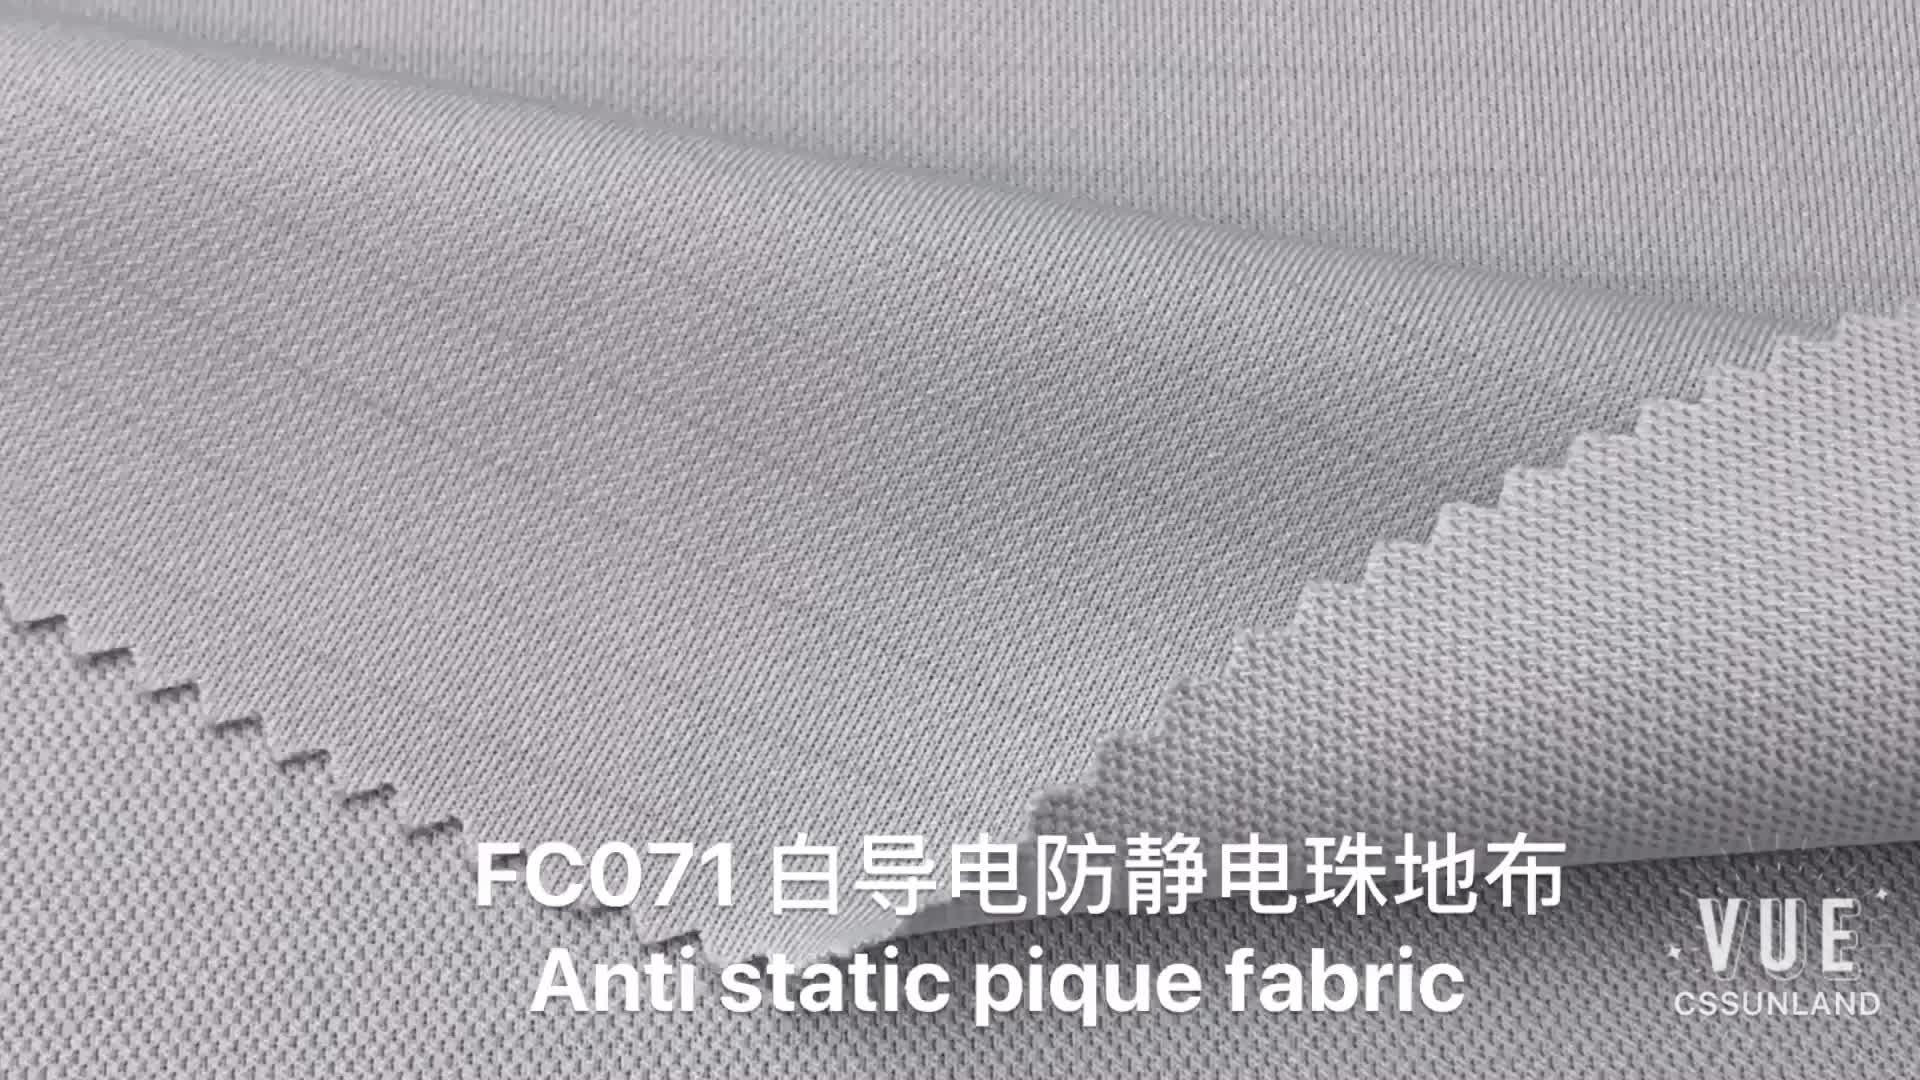 gas station worker uniform clothes 28 Gauge knit 99% polyester 1% belltron white anti static carbon pique mesh fabric